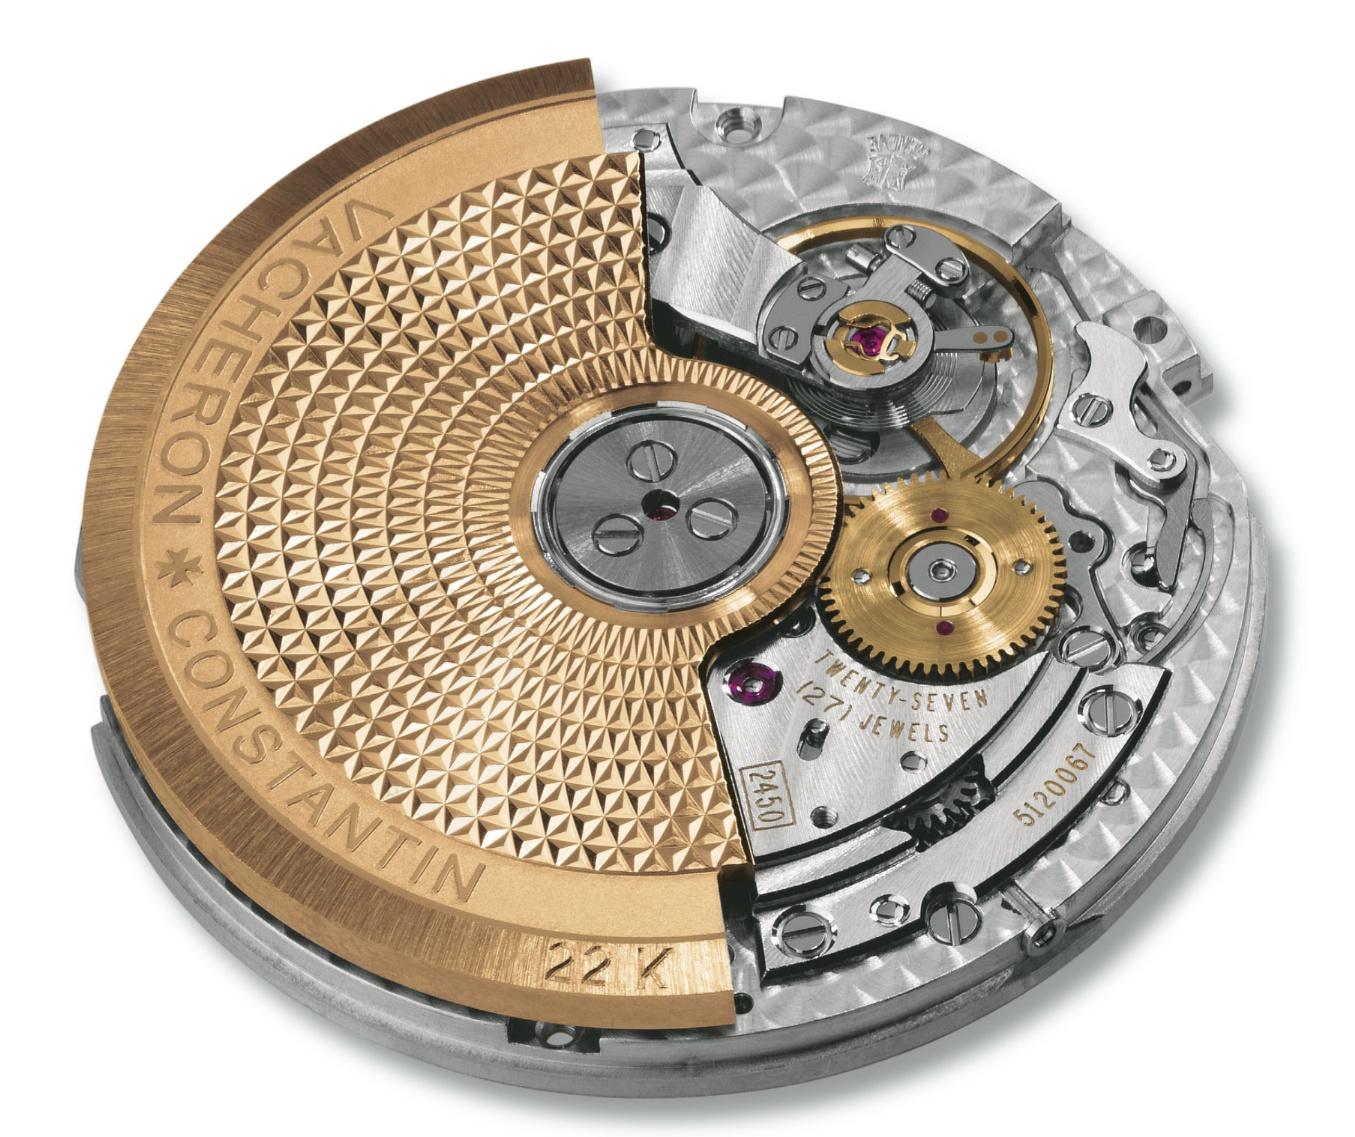 vacheron - Vacheron Constantin: Calibre automatique 2450 Vc2450